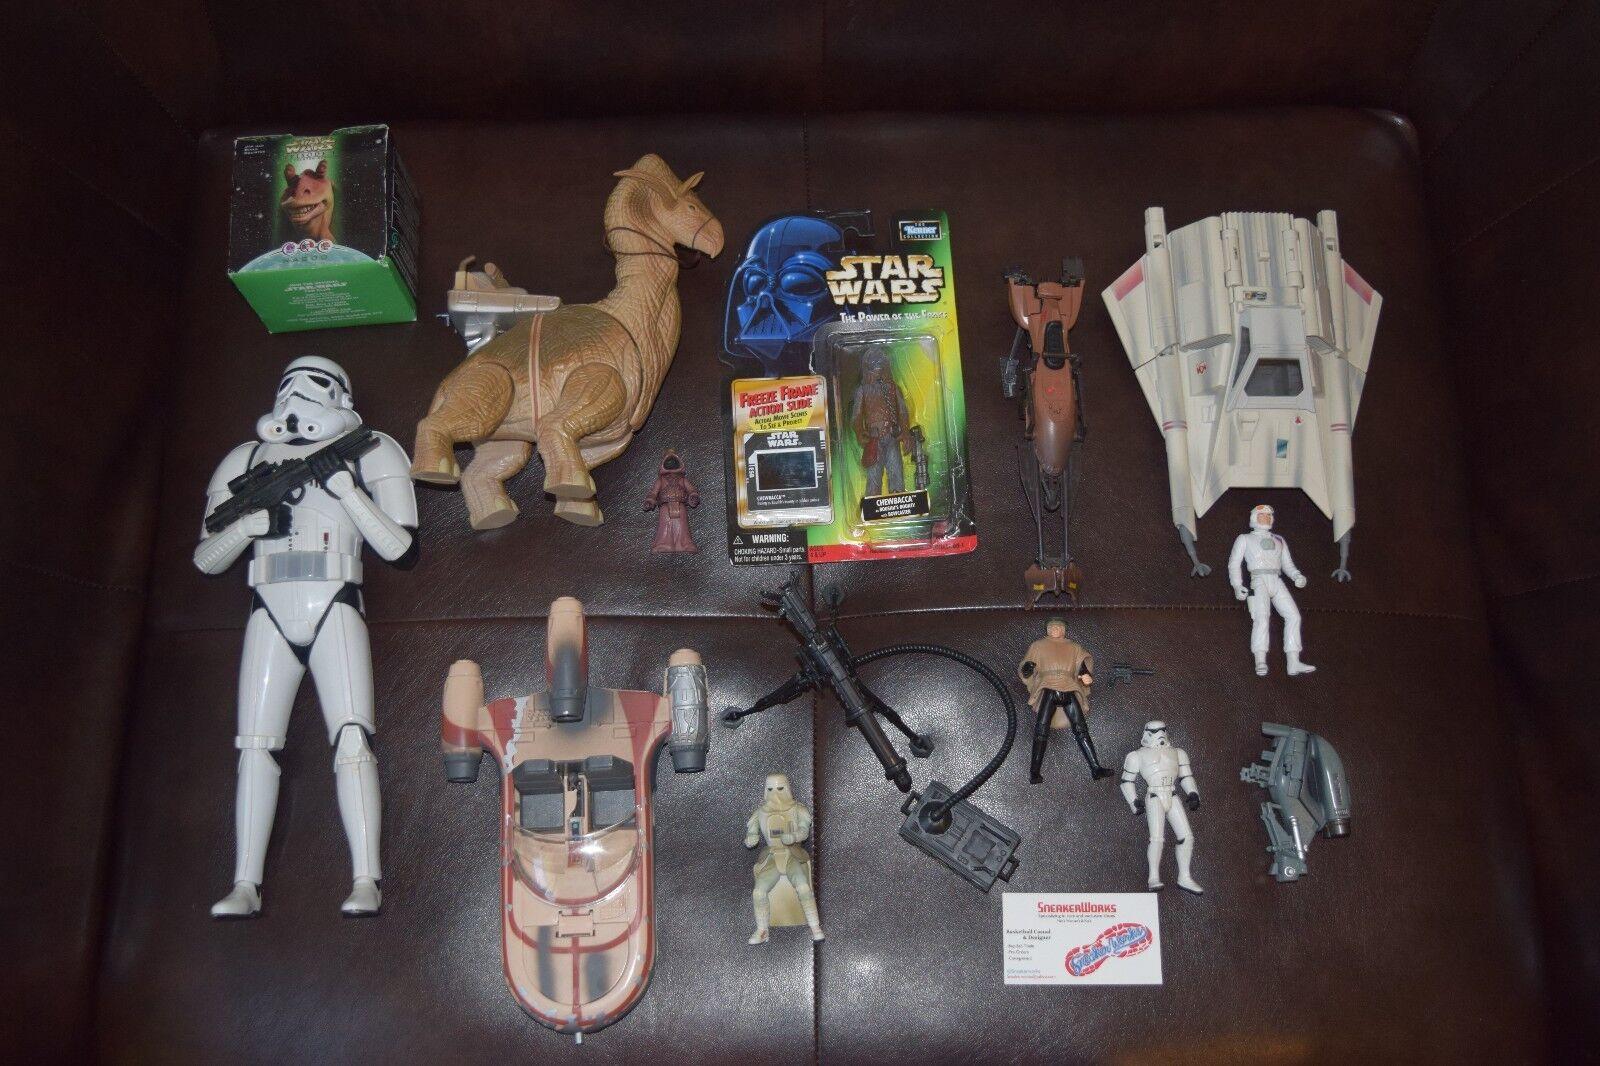 Lote De Estrella Wars Stormtrooper Luke Speederbike Airspeedr Chewbacca Snowtrooper